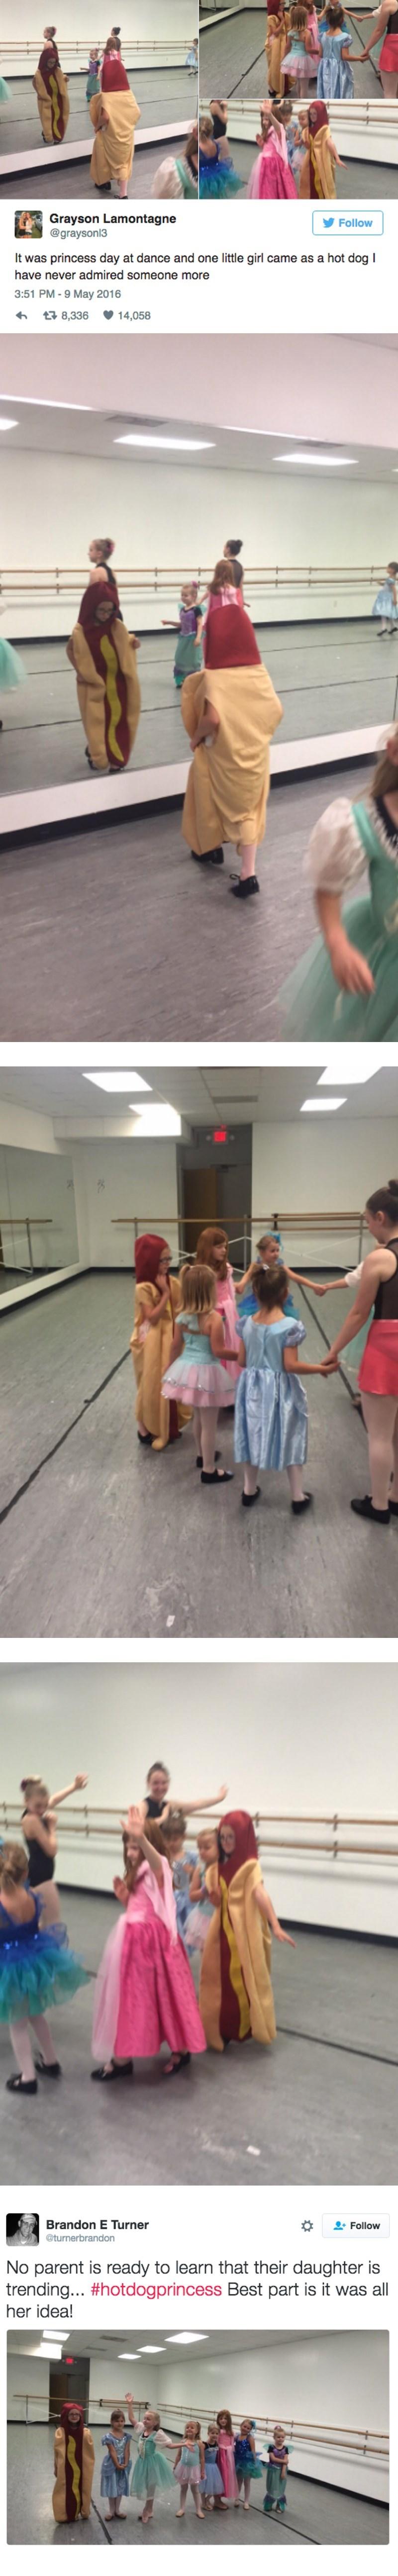 princess,hot dog,twitter,parenting,dance